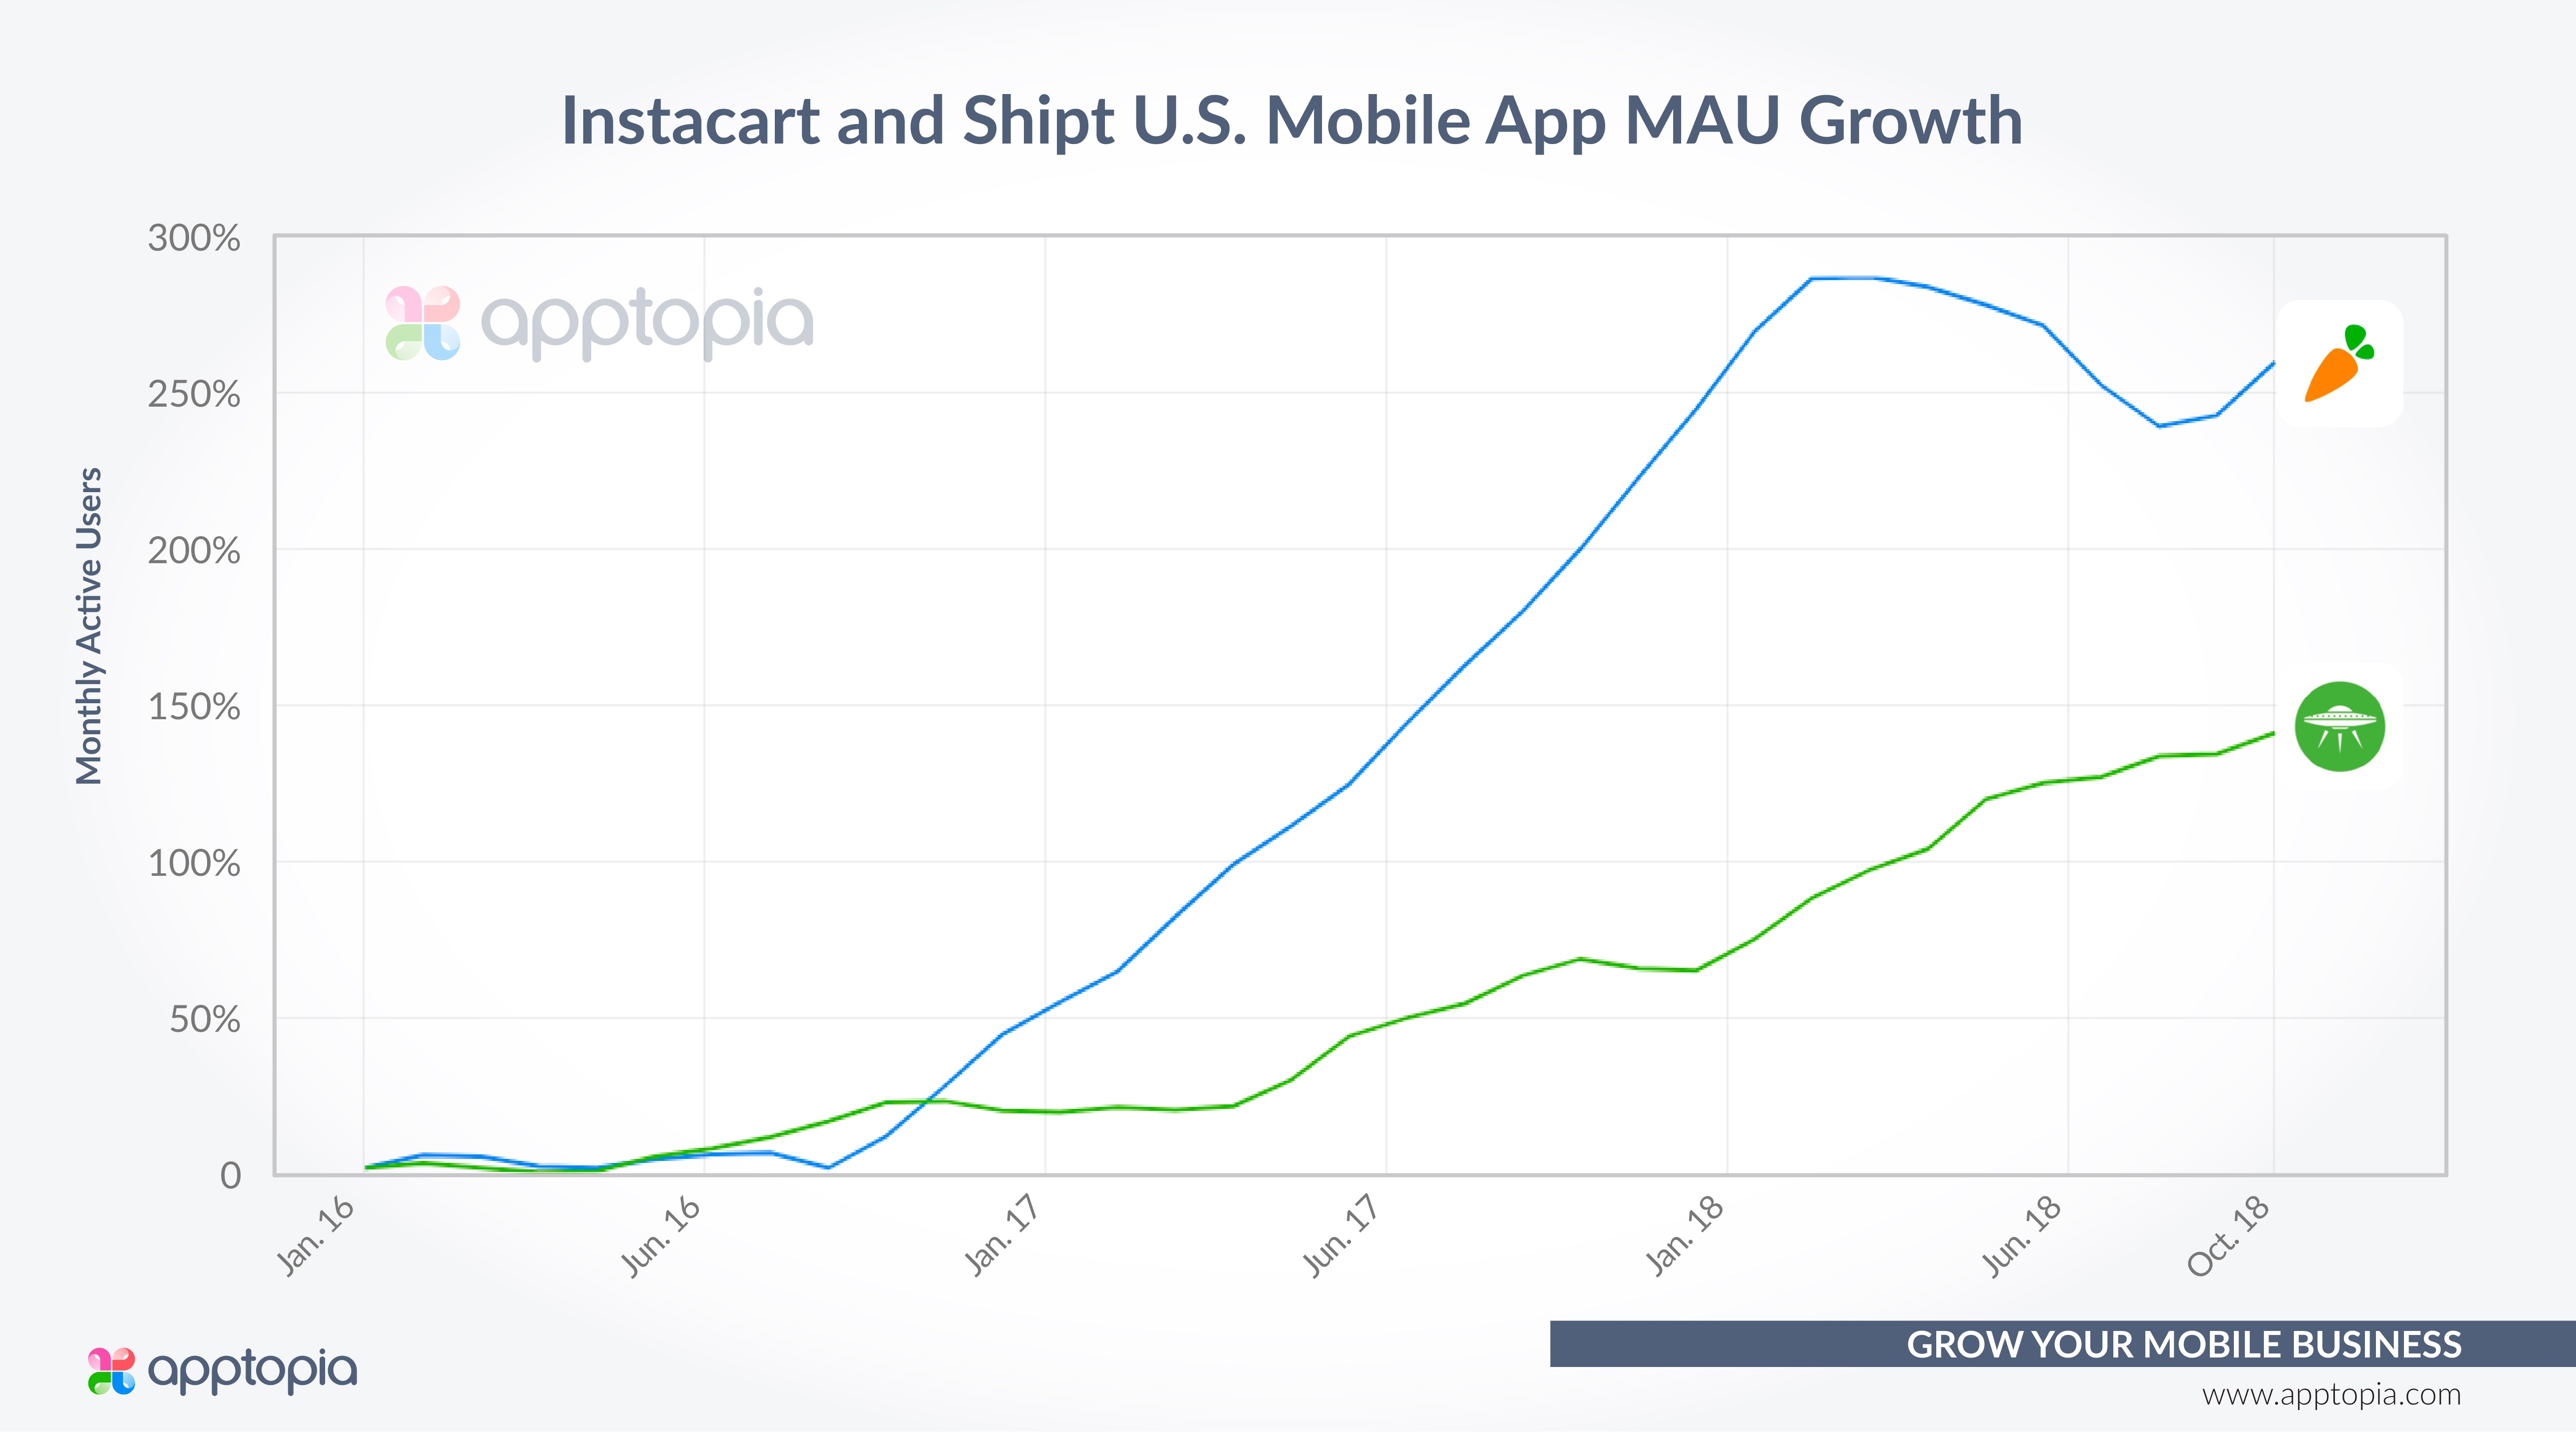 Shipt_Instacart MAU Growth